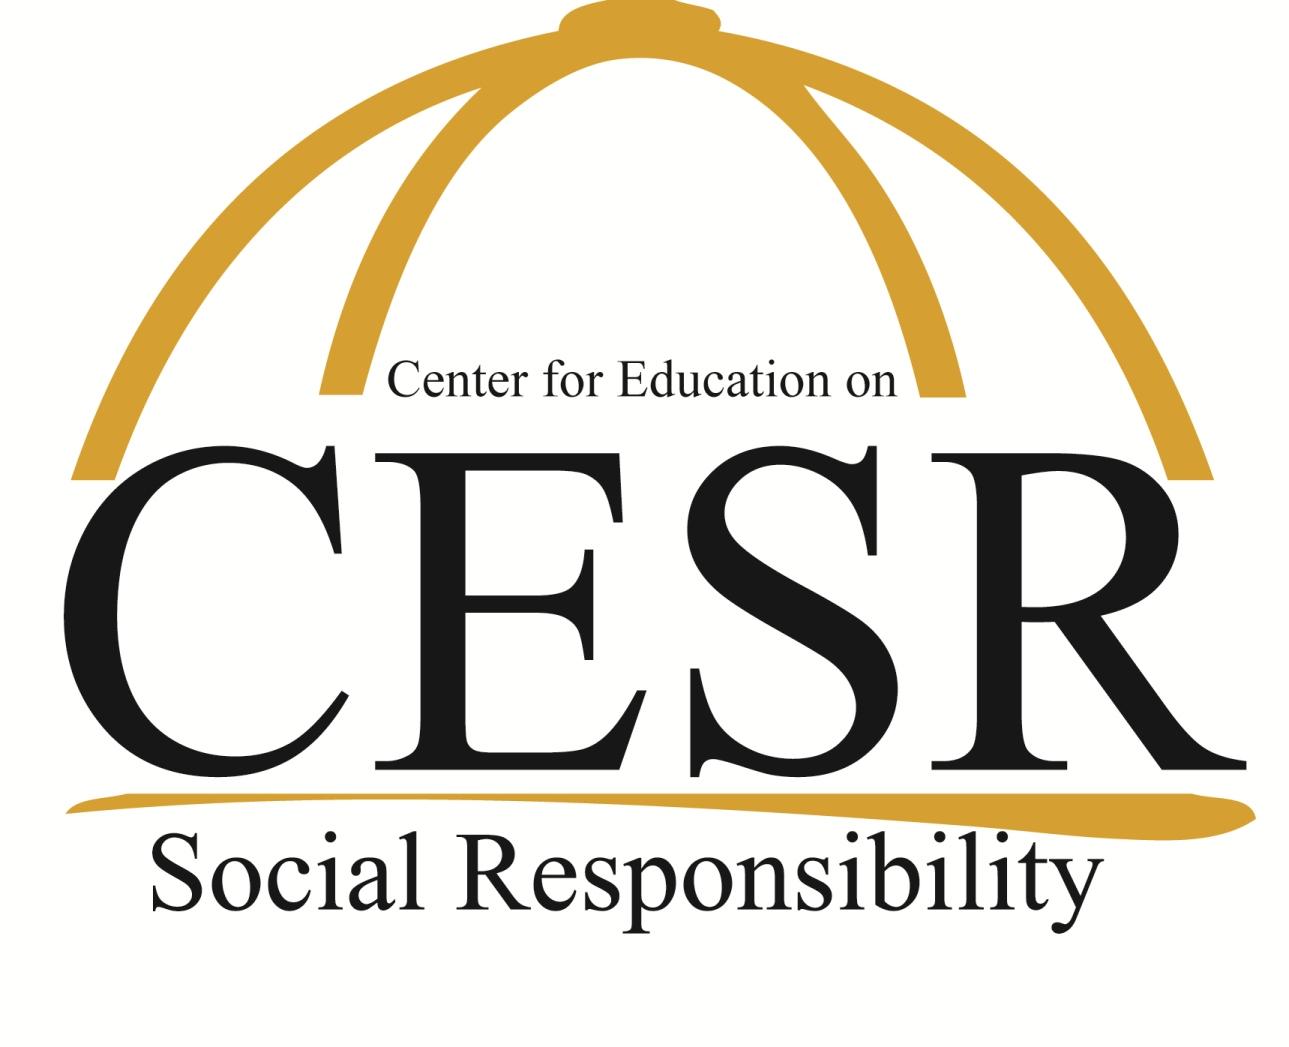 CESR Cuppola Logo